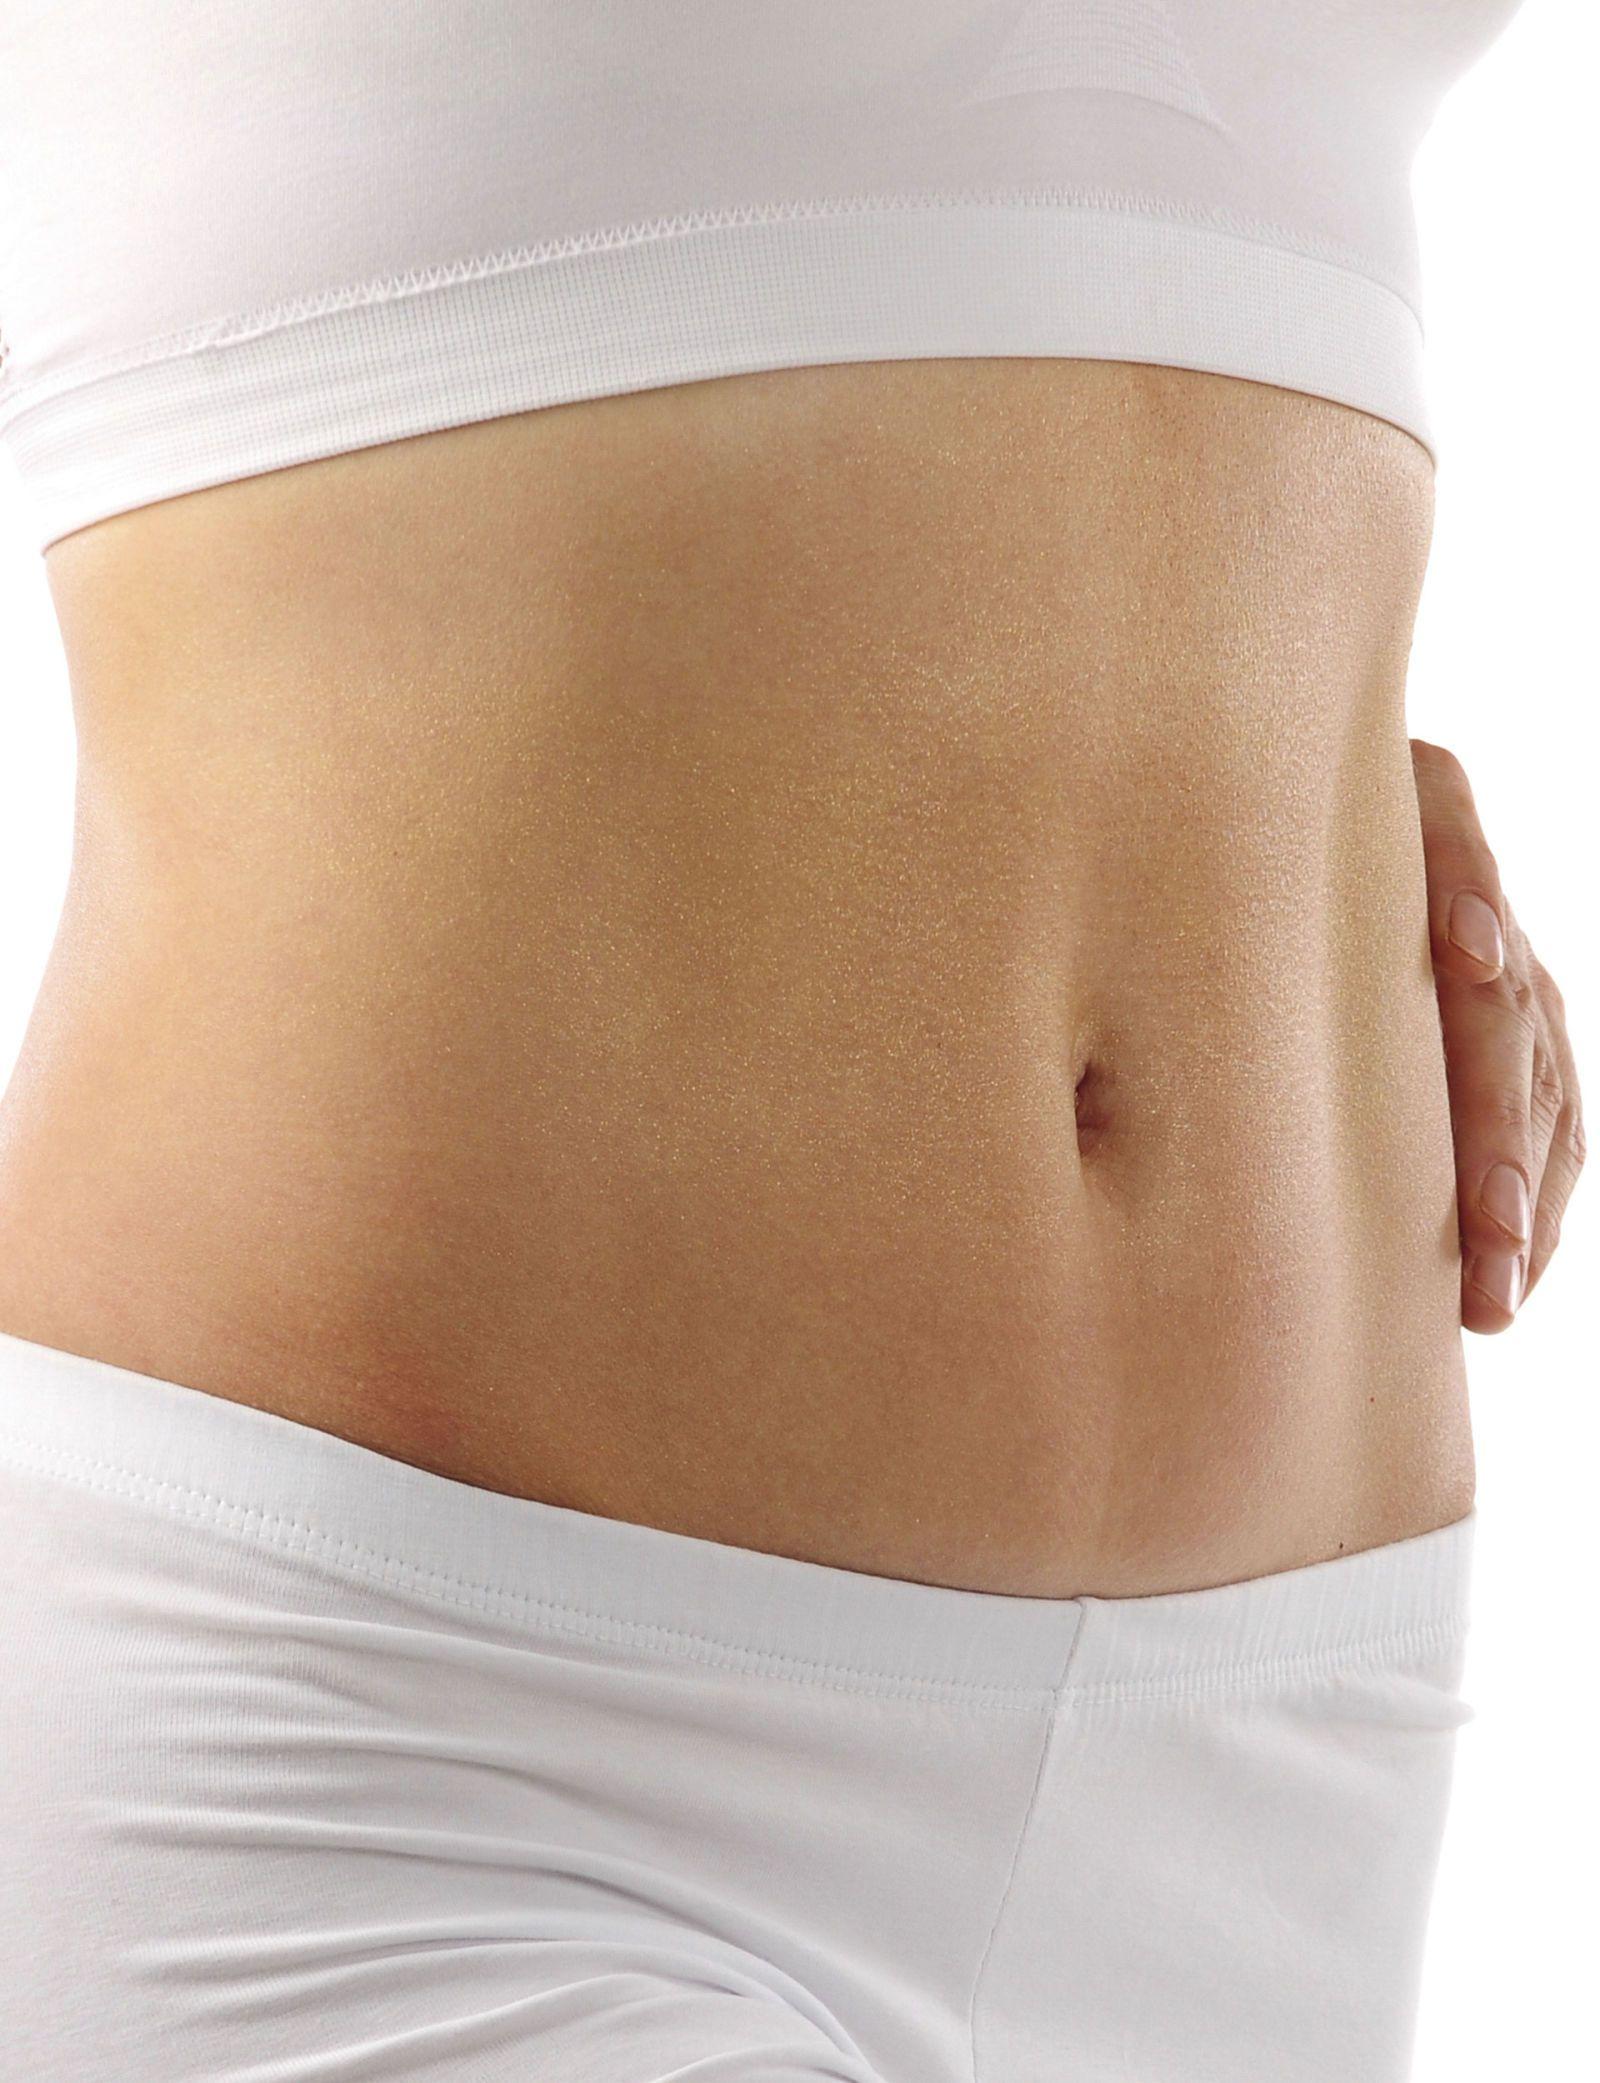 Women Body Parts Womens Bodies